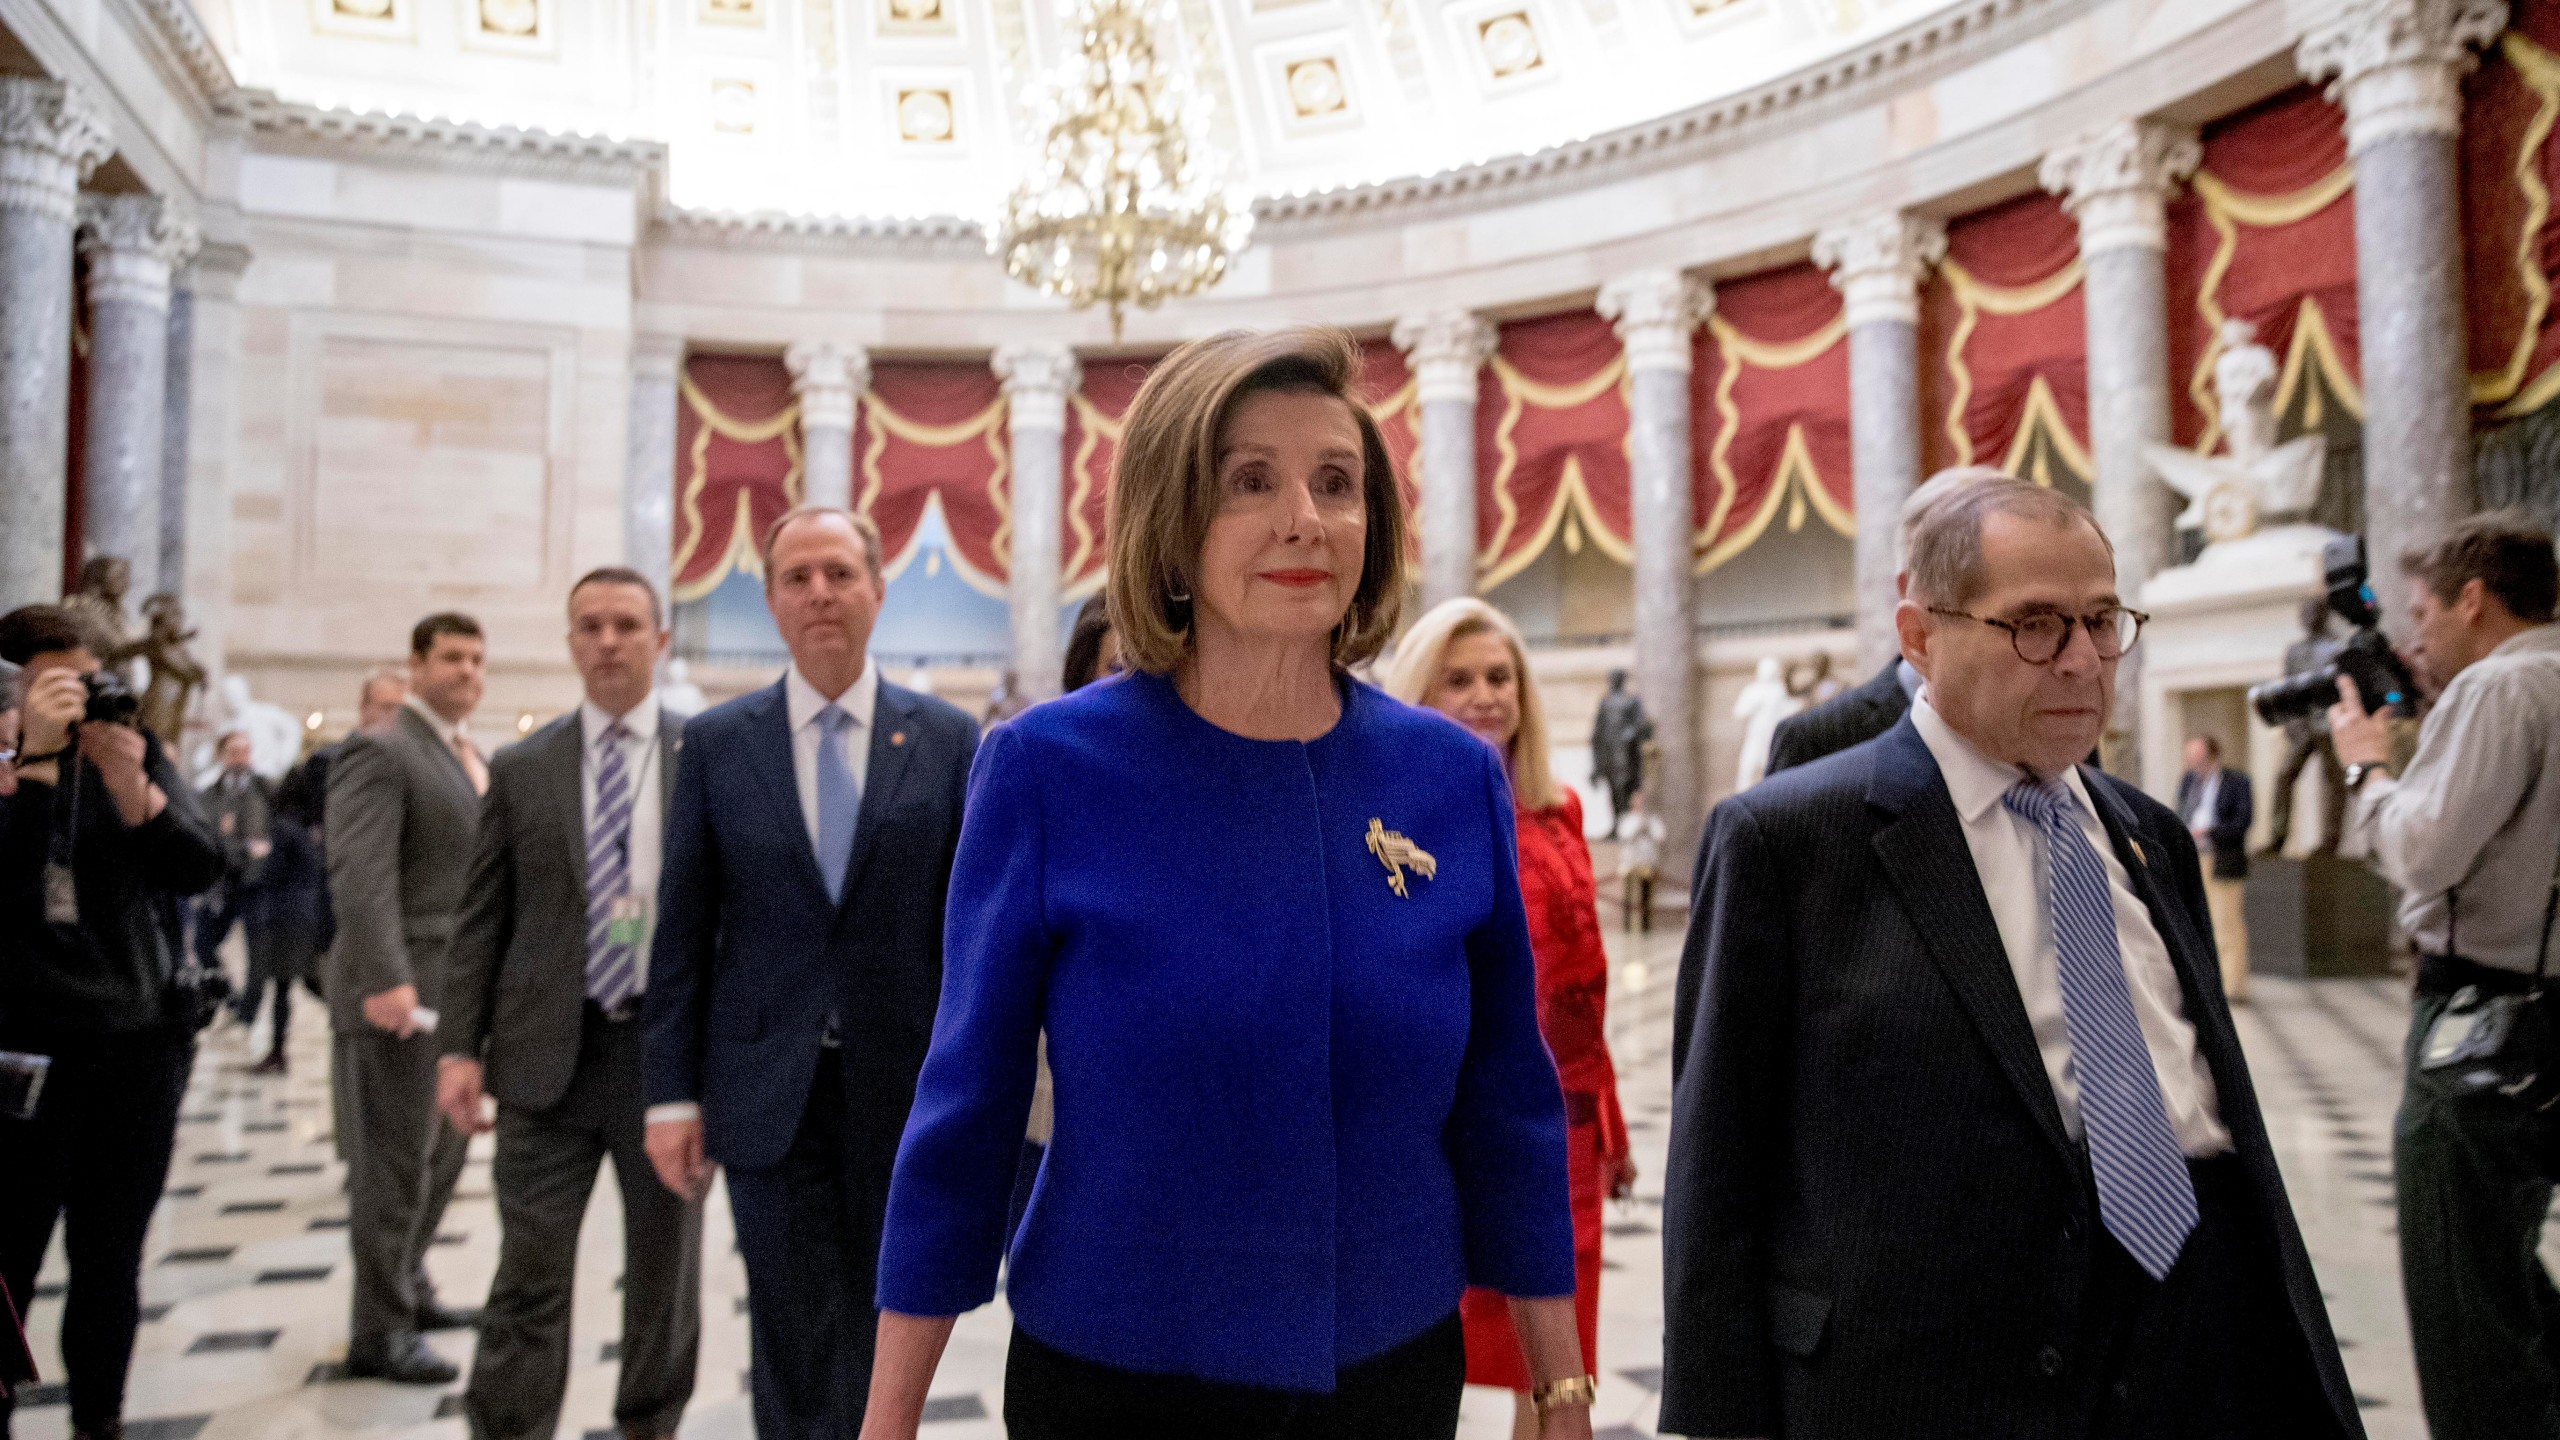 Jerrold Nadler, Adam Schiff, Carolyn Maloney, Nancy Pelosi